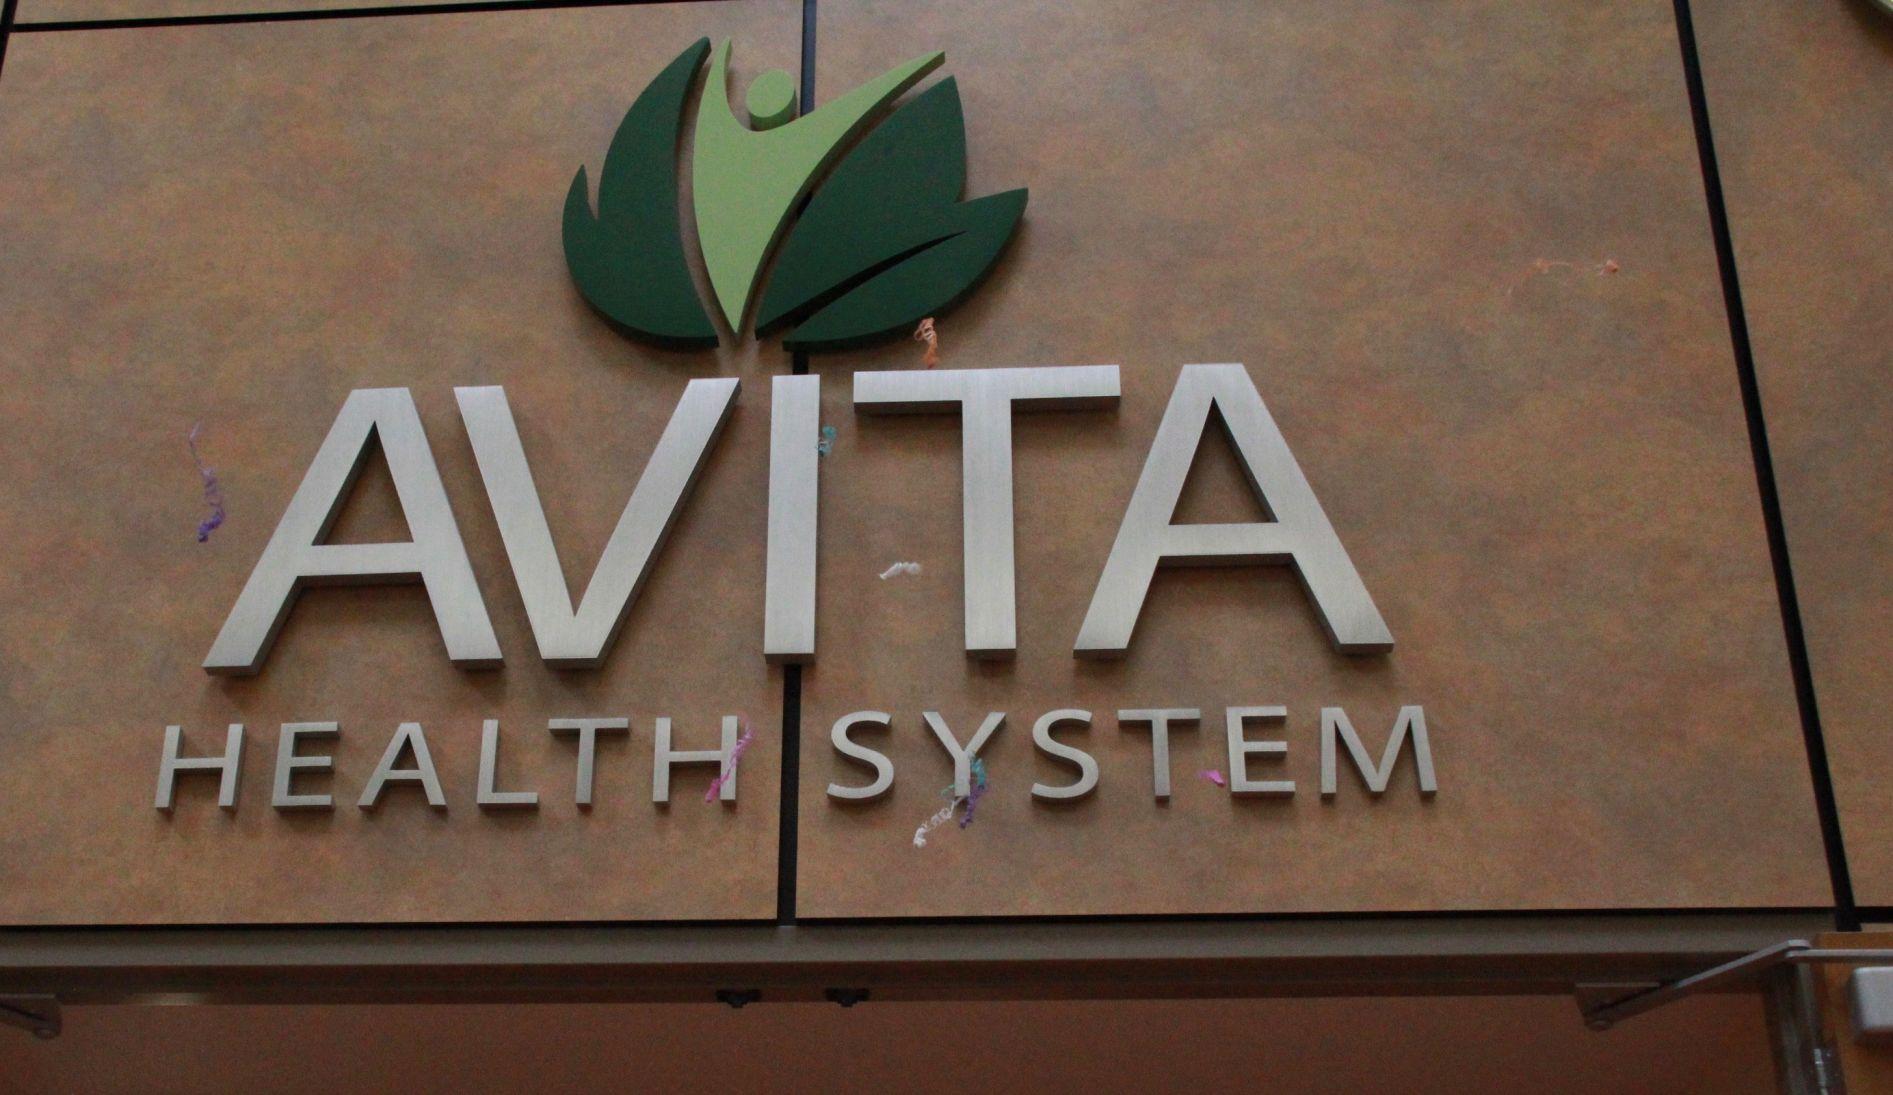 Avita Health System recognizes 3 Daisy Award nurses